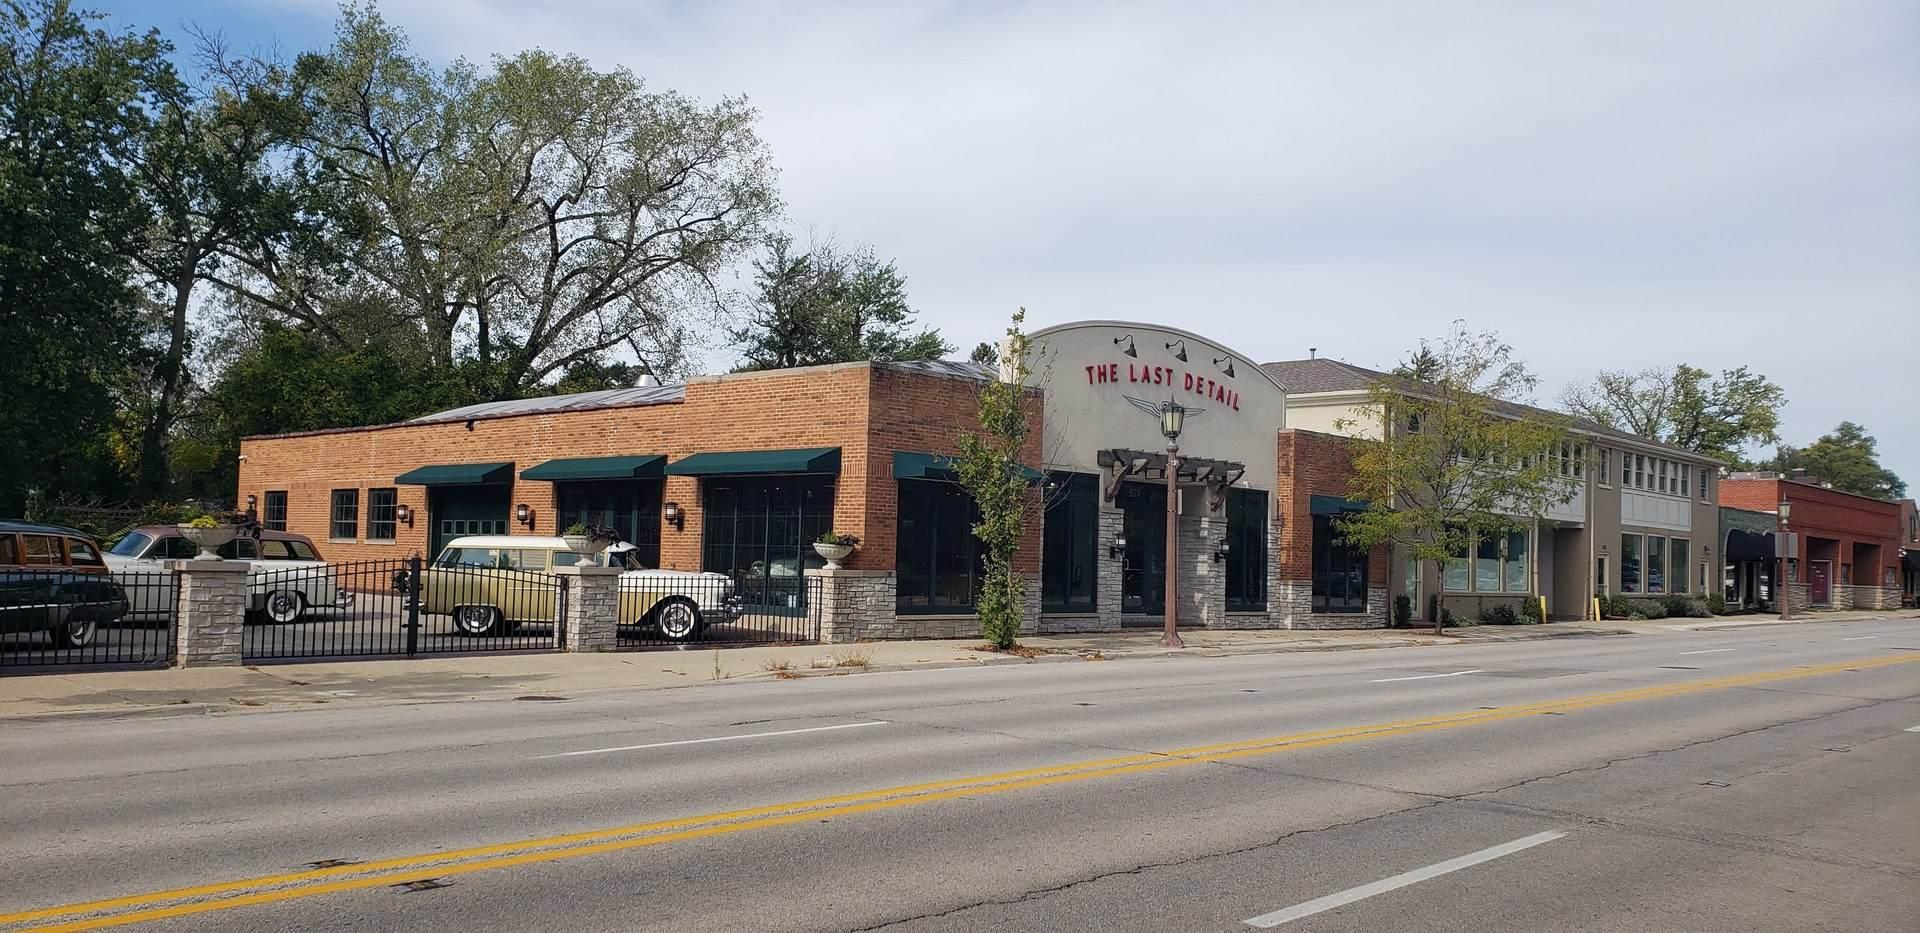 624 Green Bay Road, Kenilworth, IL 60043 (MLS #10932384) :: Helen Oliveri Real Estate